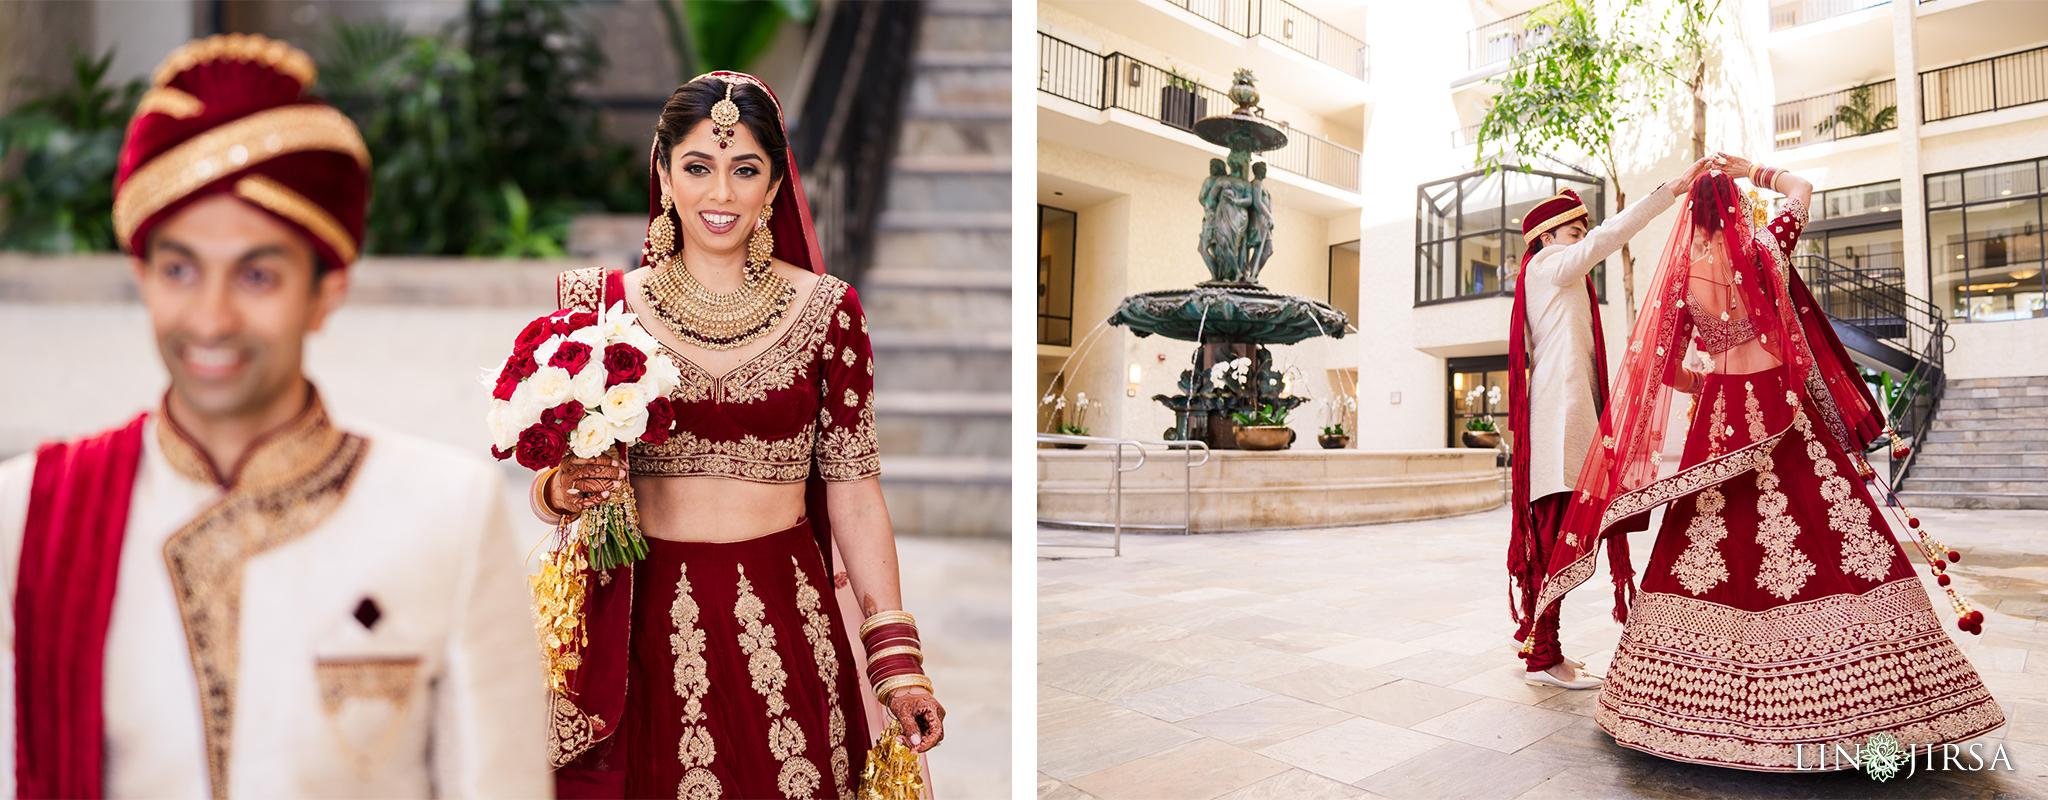 05 Newport Beach Marriott Indian Wedding Photography